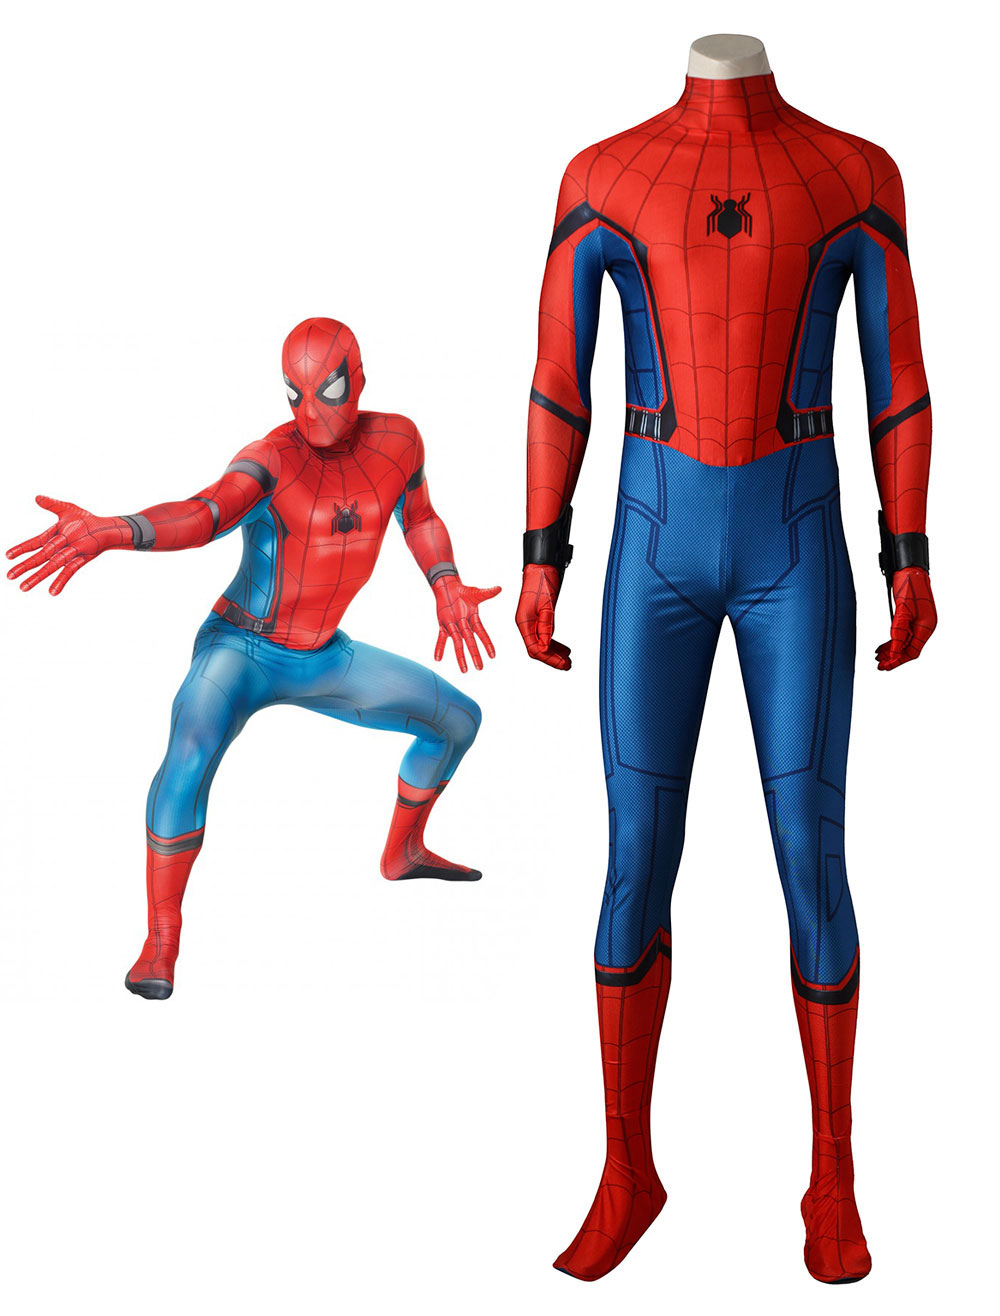 Marvel Comics Spiderman Homecoming Movie Peter Benjamin Parker Cosplay Costume In 4 Pieces